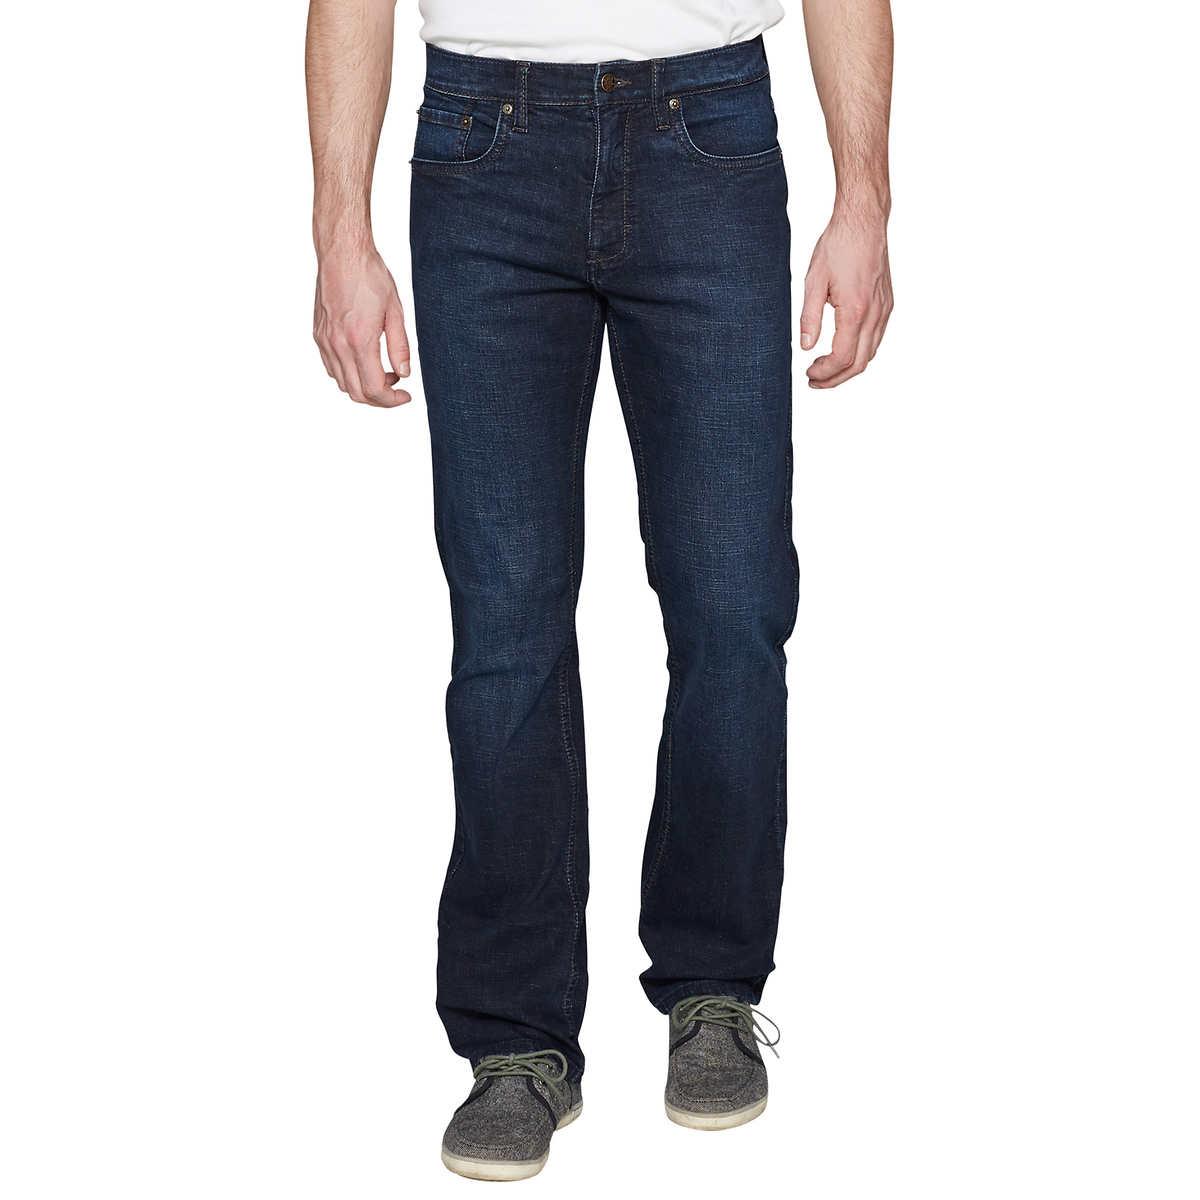 db13dfa3cbfd33 Urban Jeans - The Best Style Jeans